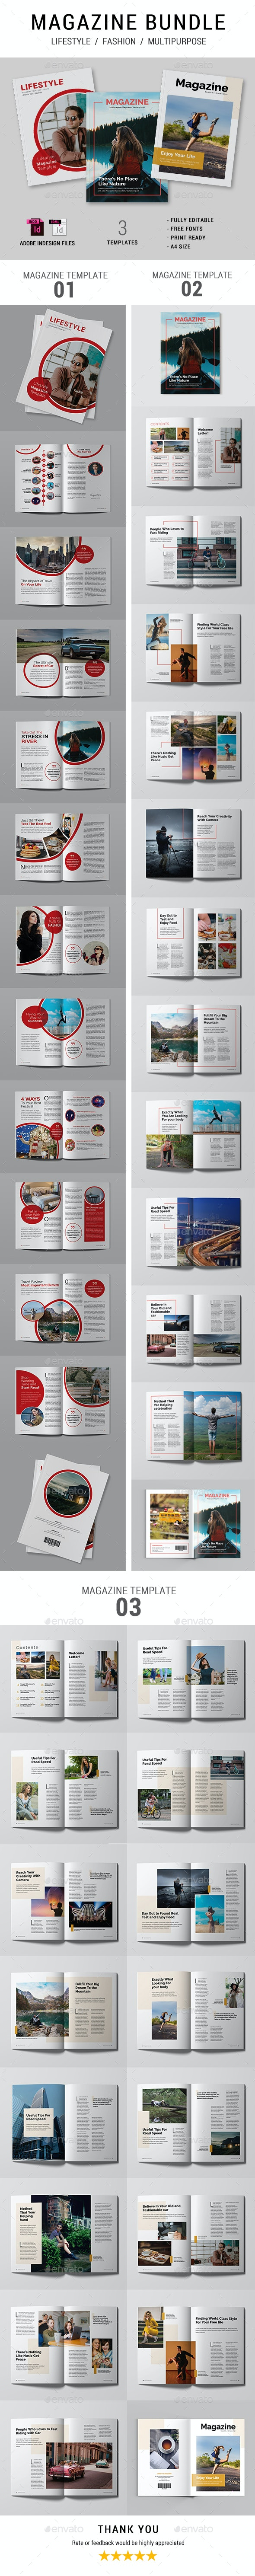 Magazine Template Bundle - Magazines Print Templates